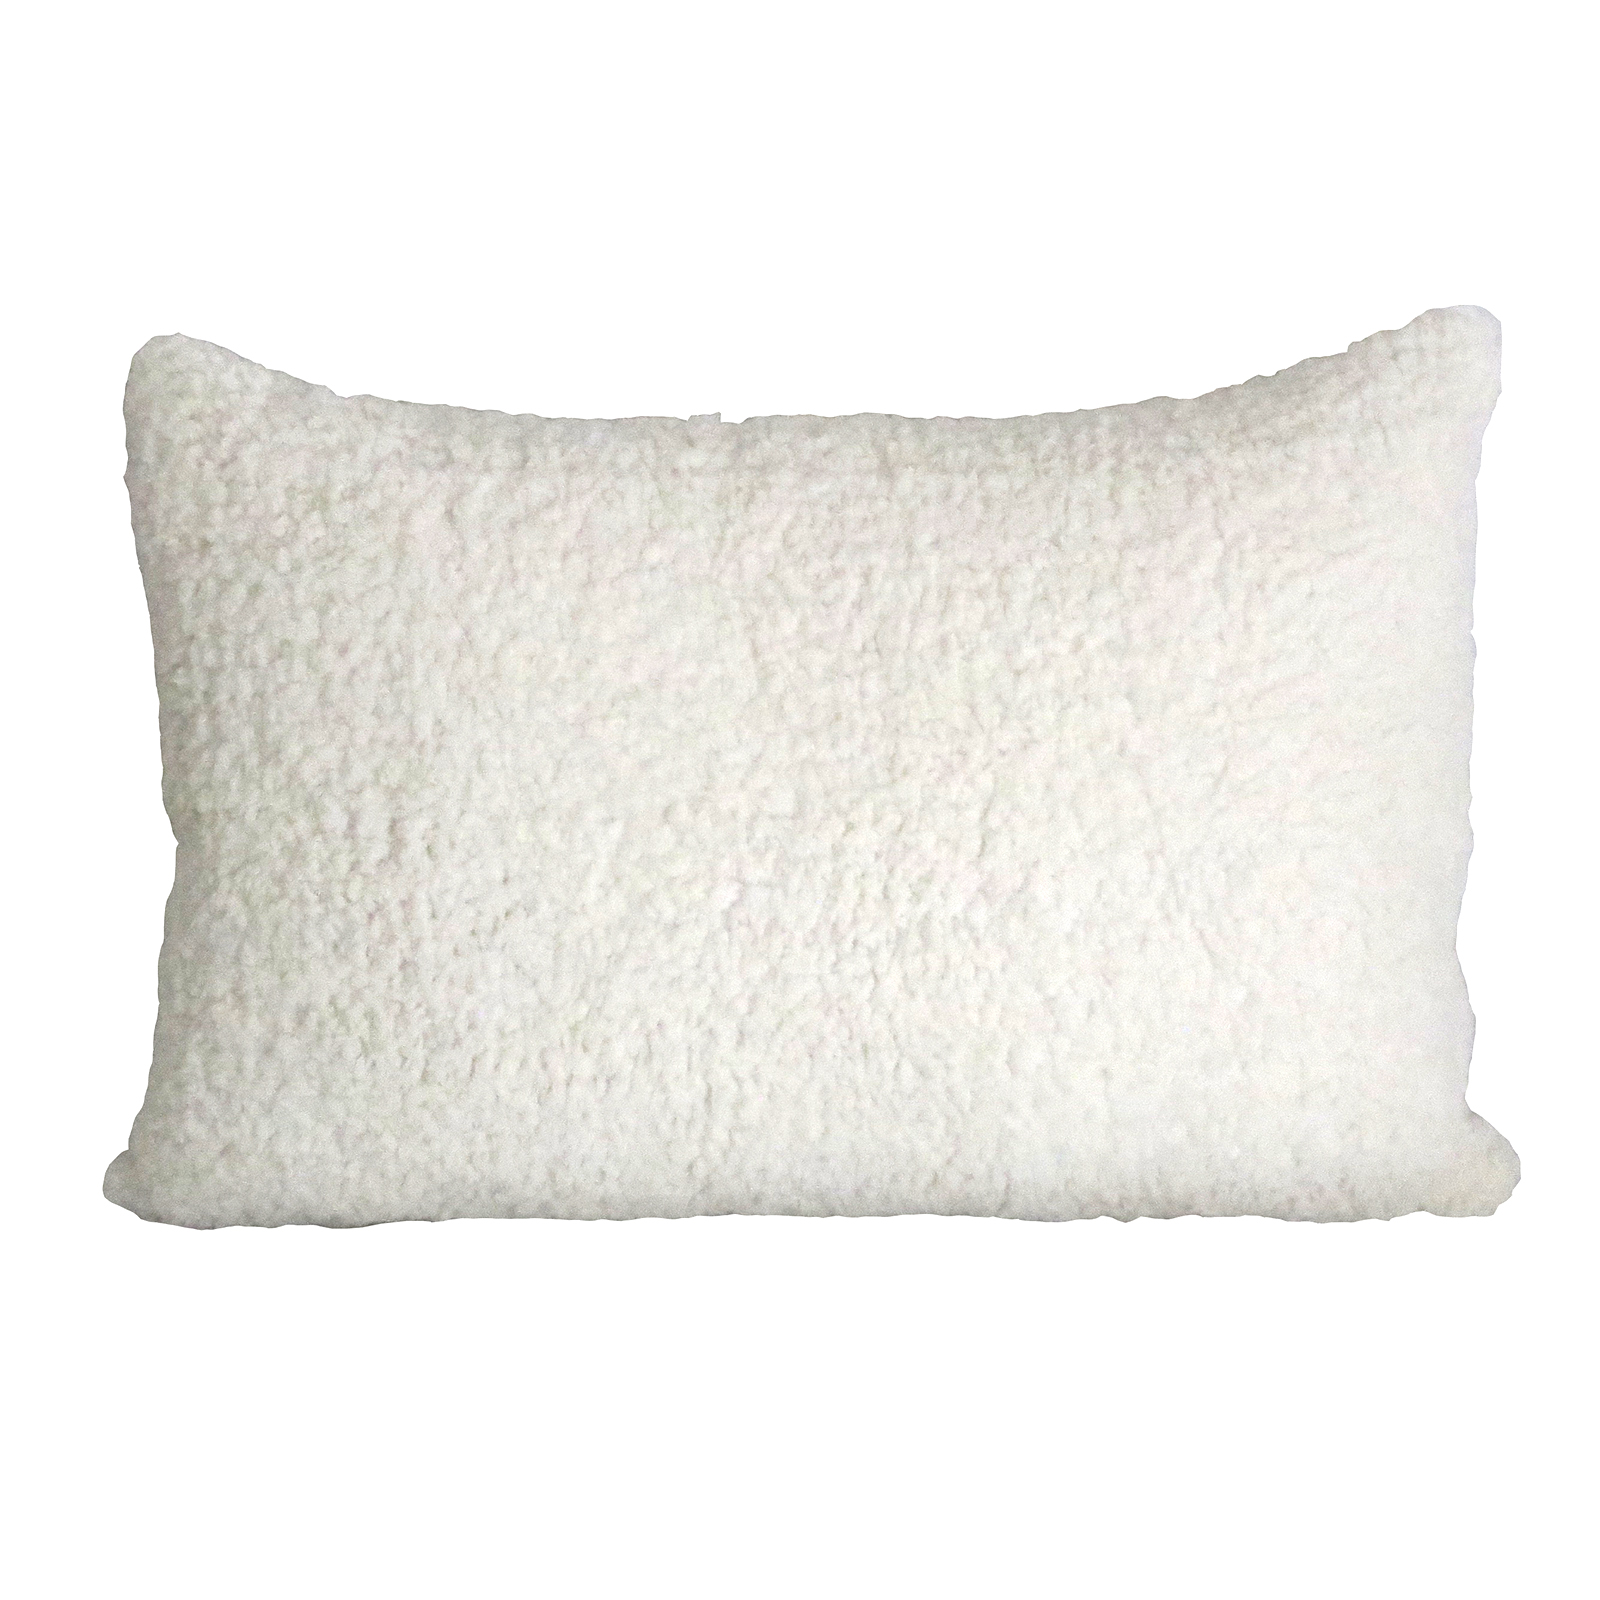 Serta Printed Sheep Pillow  Home  Bed  Bath  Bedding